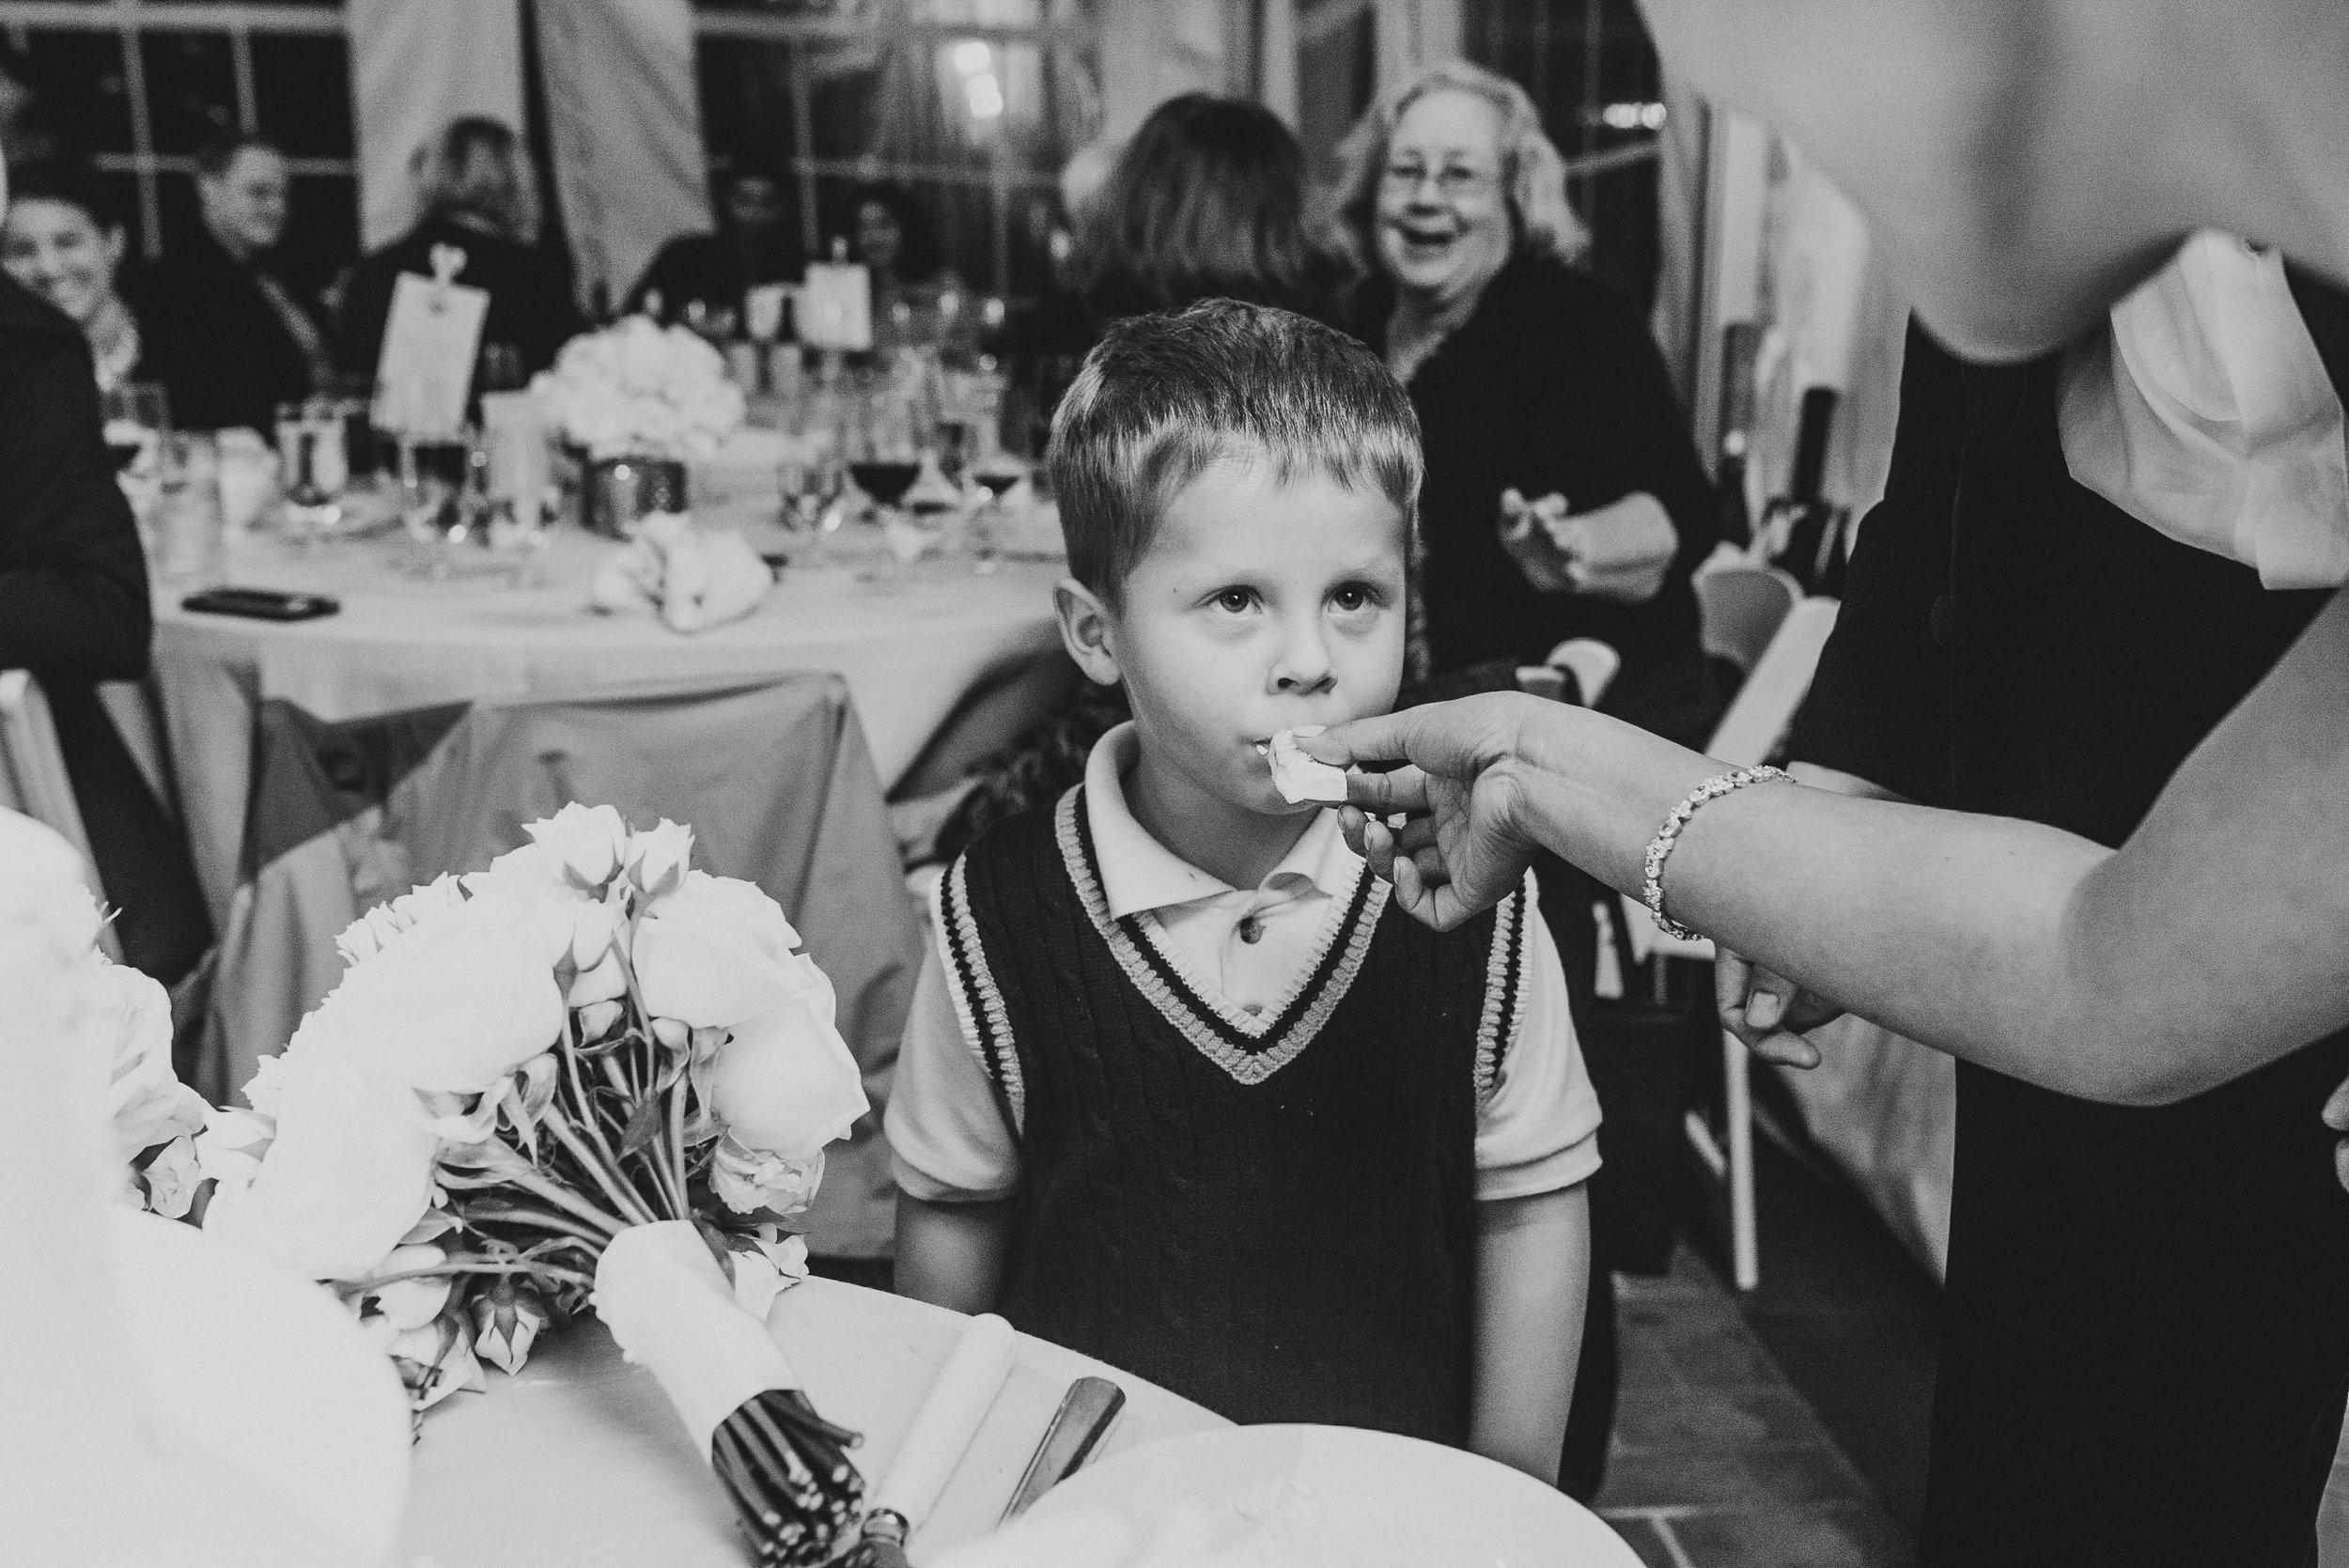 Wedding at Woodlawn Manor Sandy Spring Maryland by Mantas Kubilinskas-26.jpg